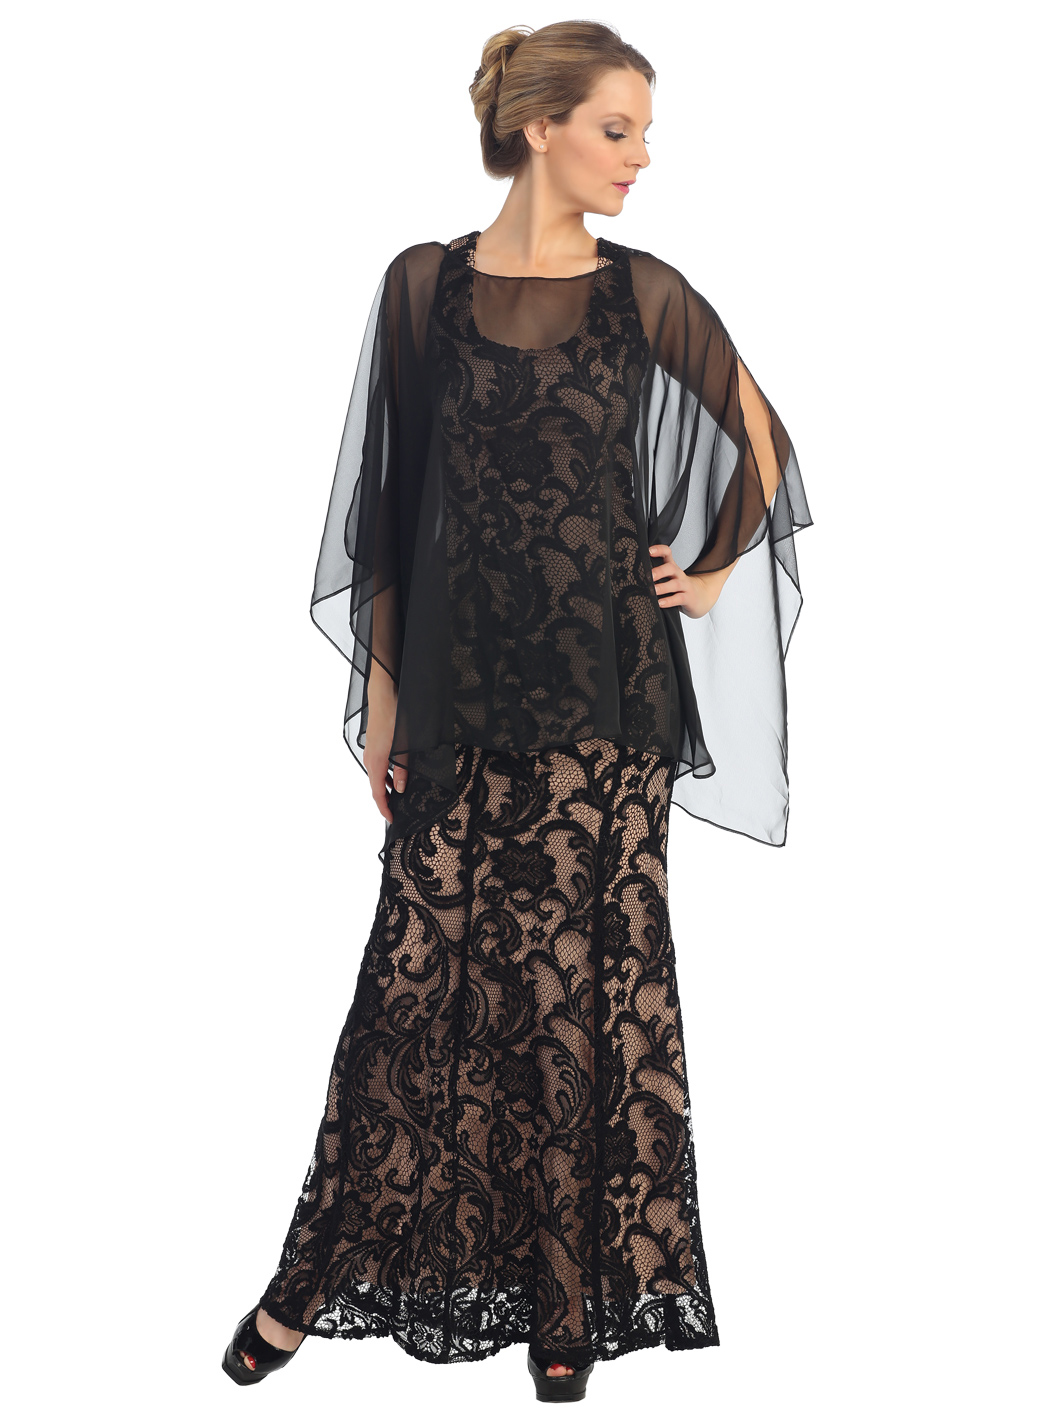 Poncho dress long sleeve